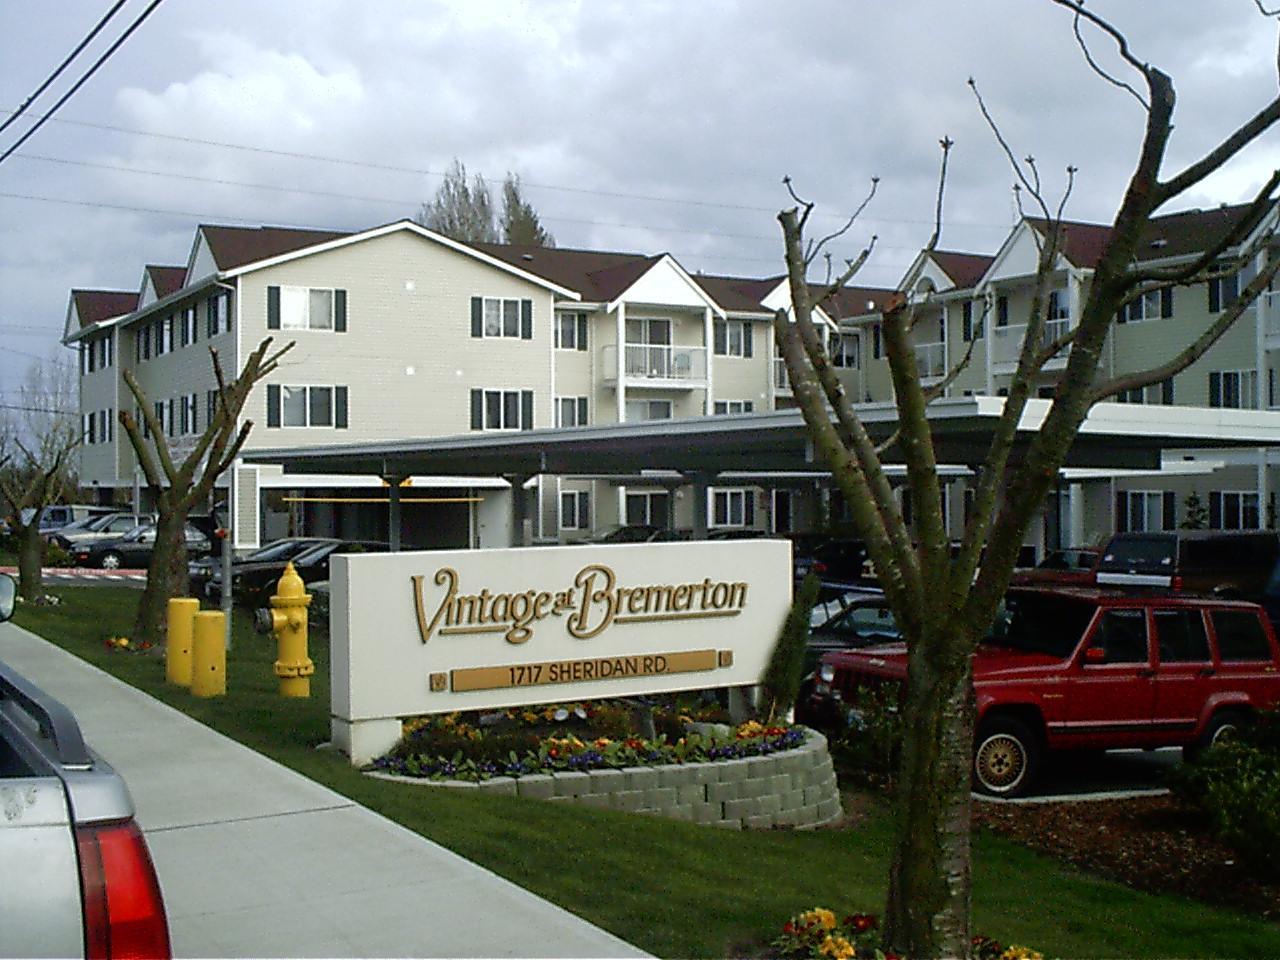 Vintage at Bremerton -n Sheridan Road, Bremerton, WA.JPG